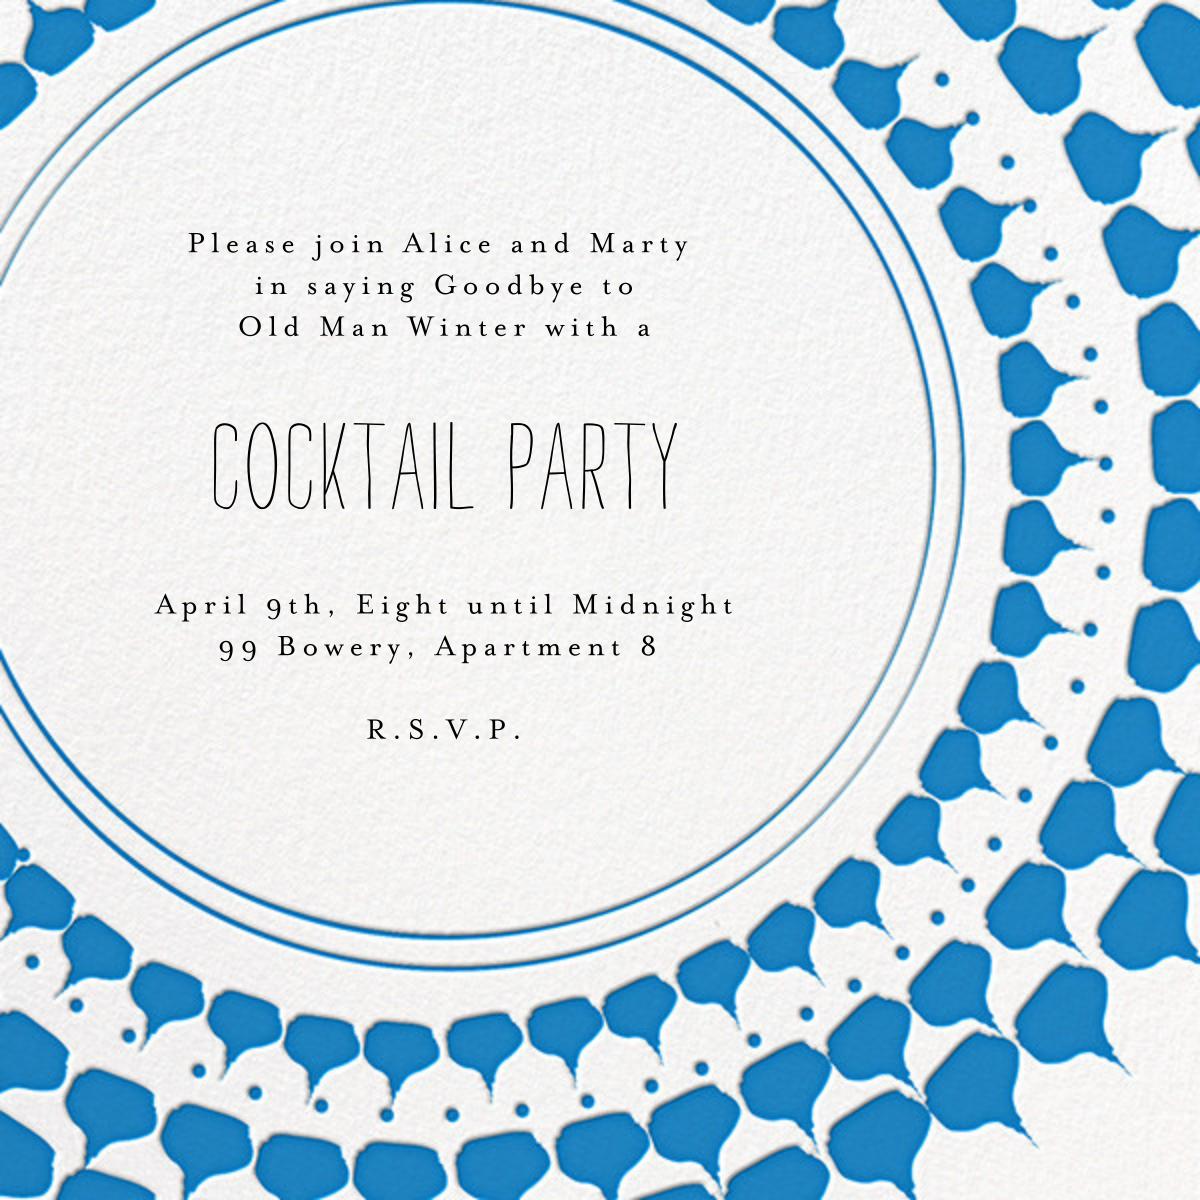 Spec in Capri - Blue - Mr. Boddington's Studio - Cocktail party